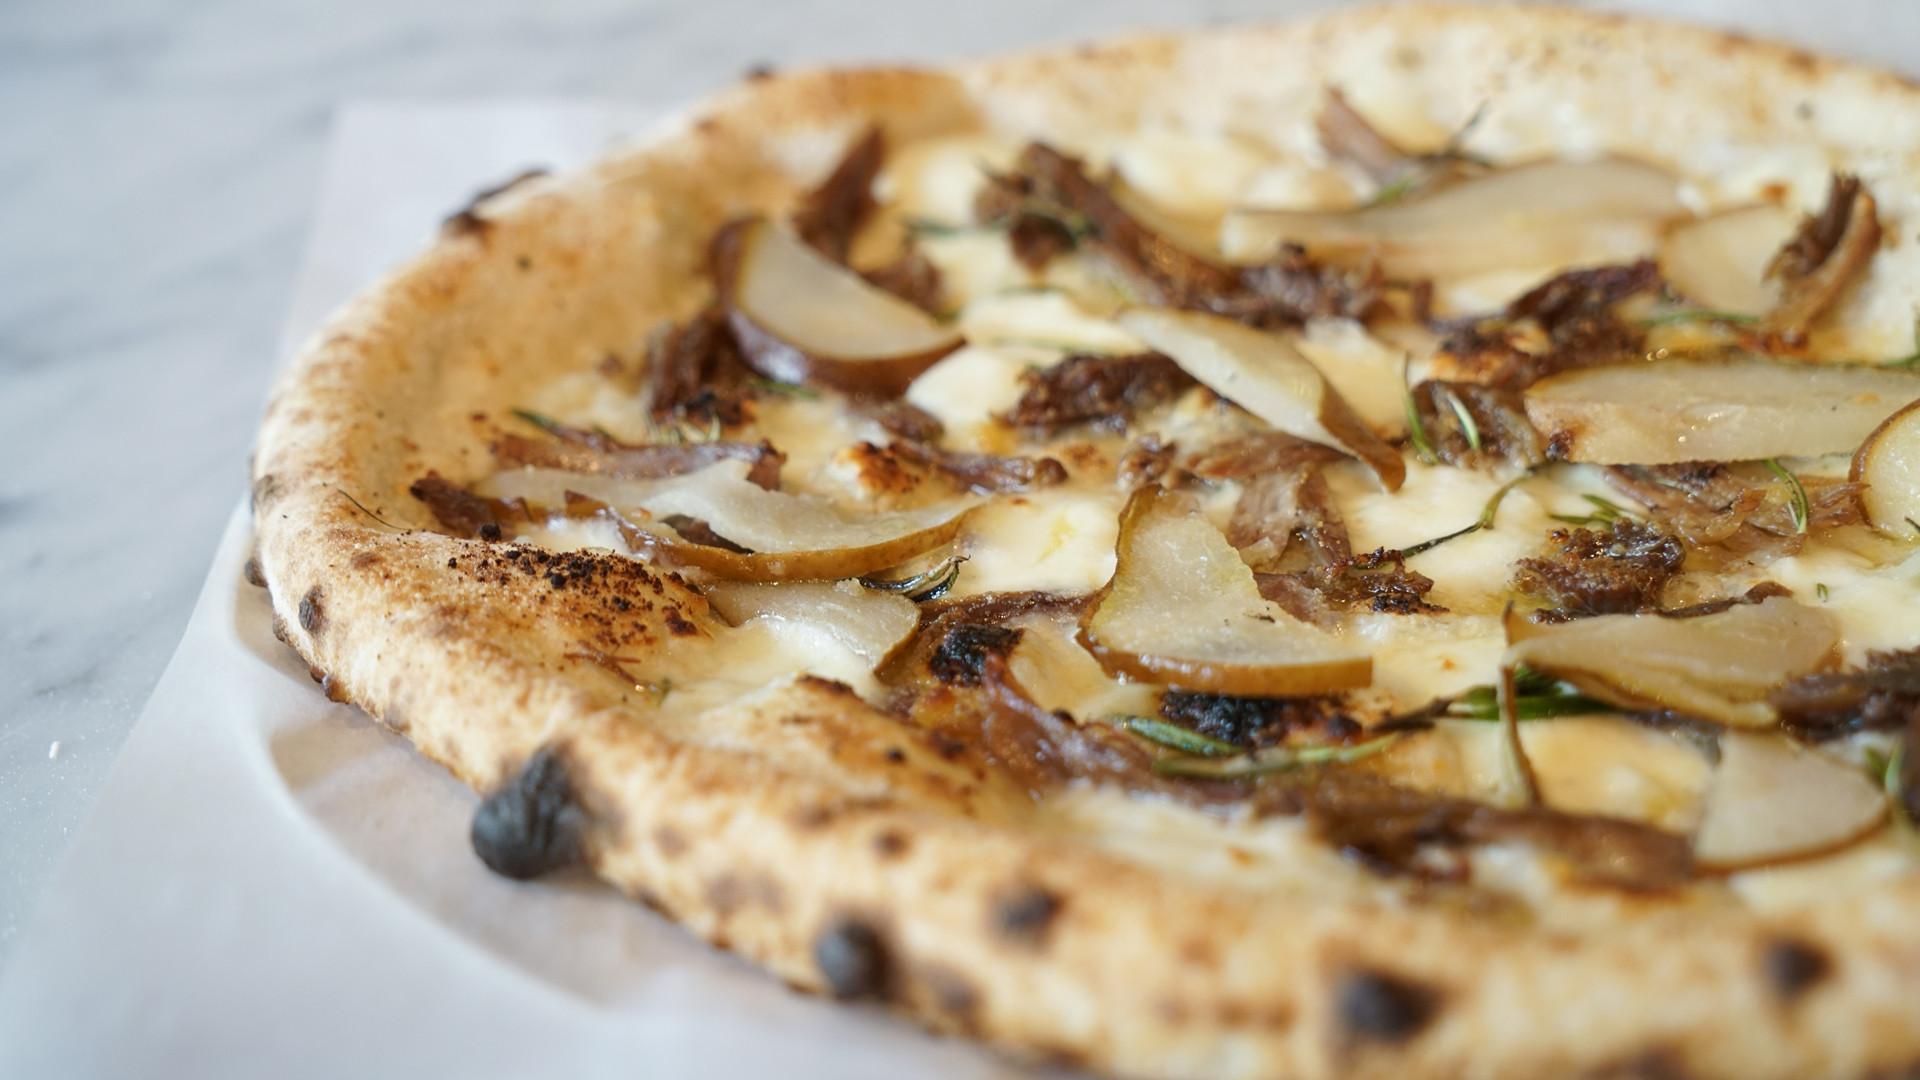 The best pizza in Toronto | A duck confit pizza at Pizzeria Libretto